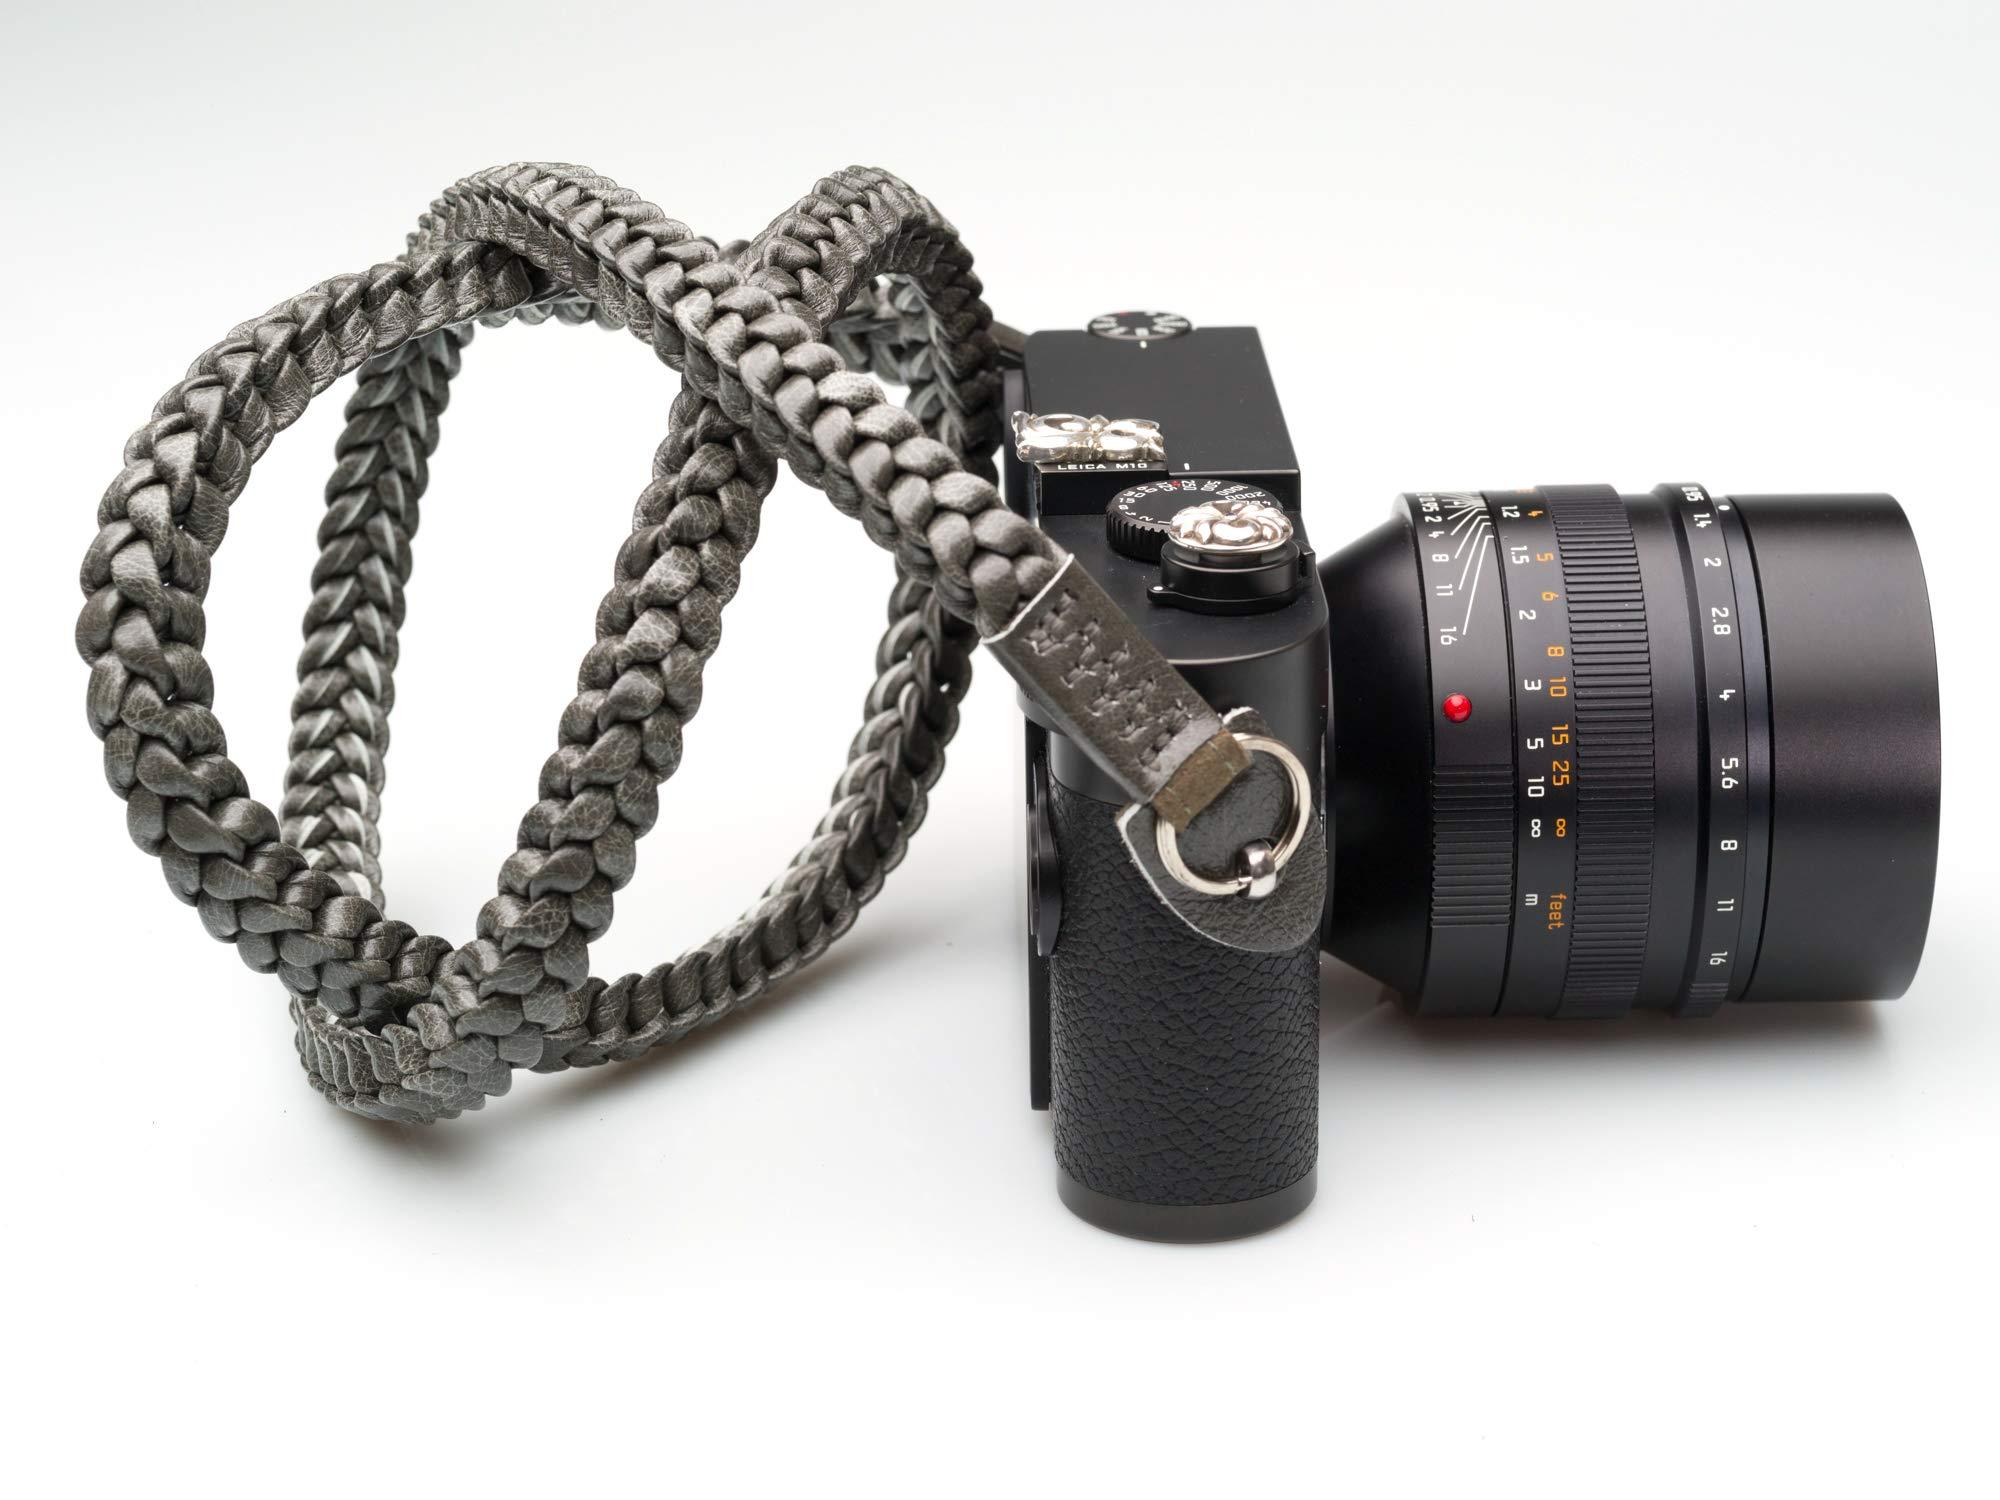 Barton1972 Silver Shade 42 inches Long Camera Strap Leica Sony Fuji Nikon Round Strap lugs Gray